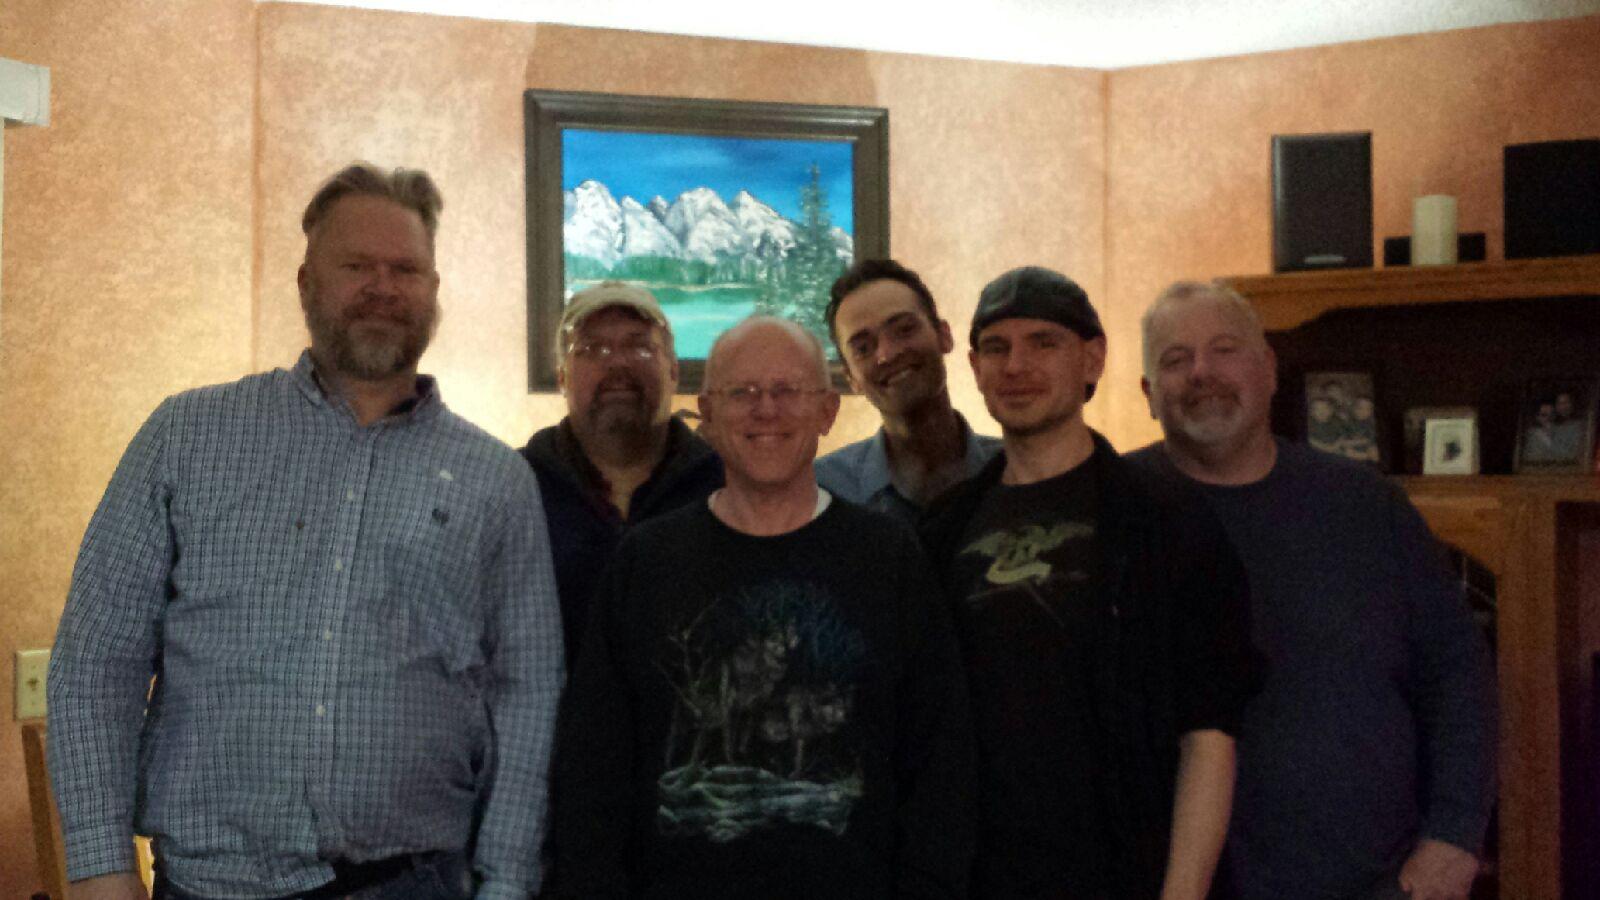 Brian, Paul, Mark, Alex, Peter, & Earle